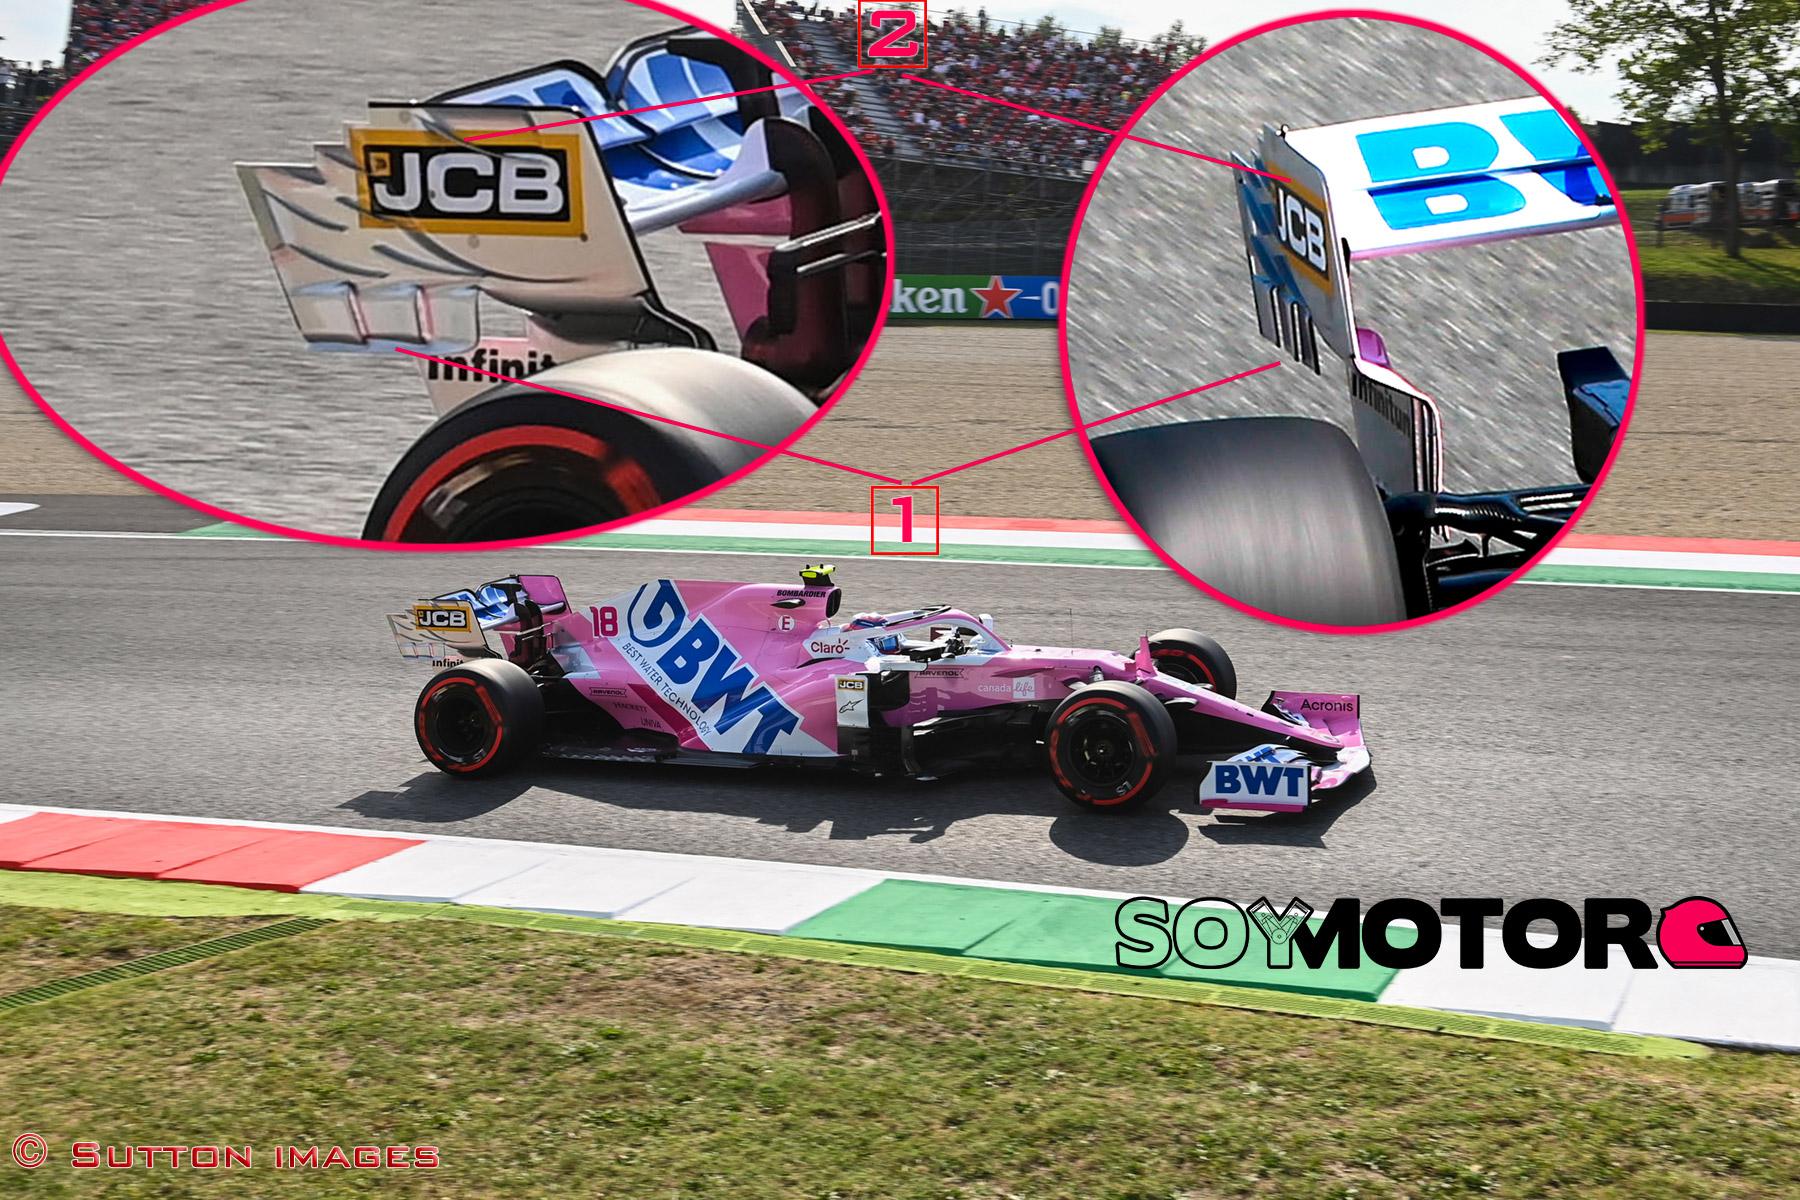 racing-point-endplate-ala-trasera-soymotor_0.jpg